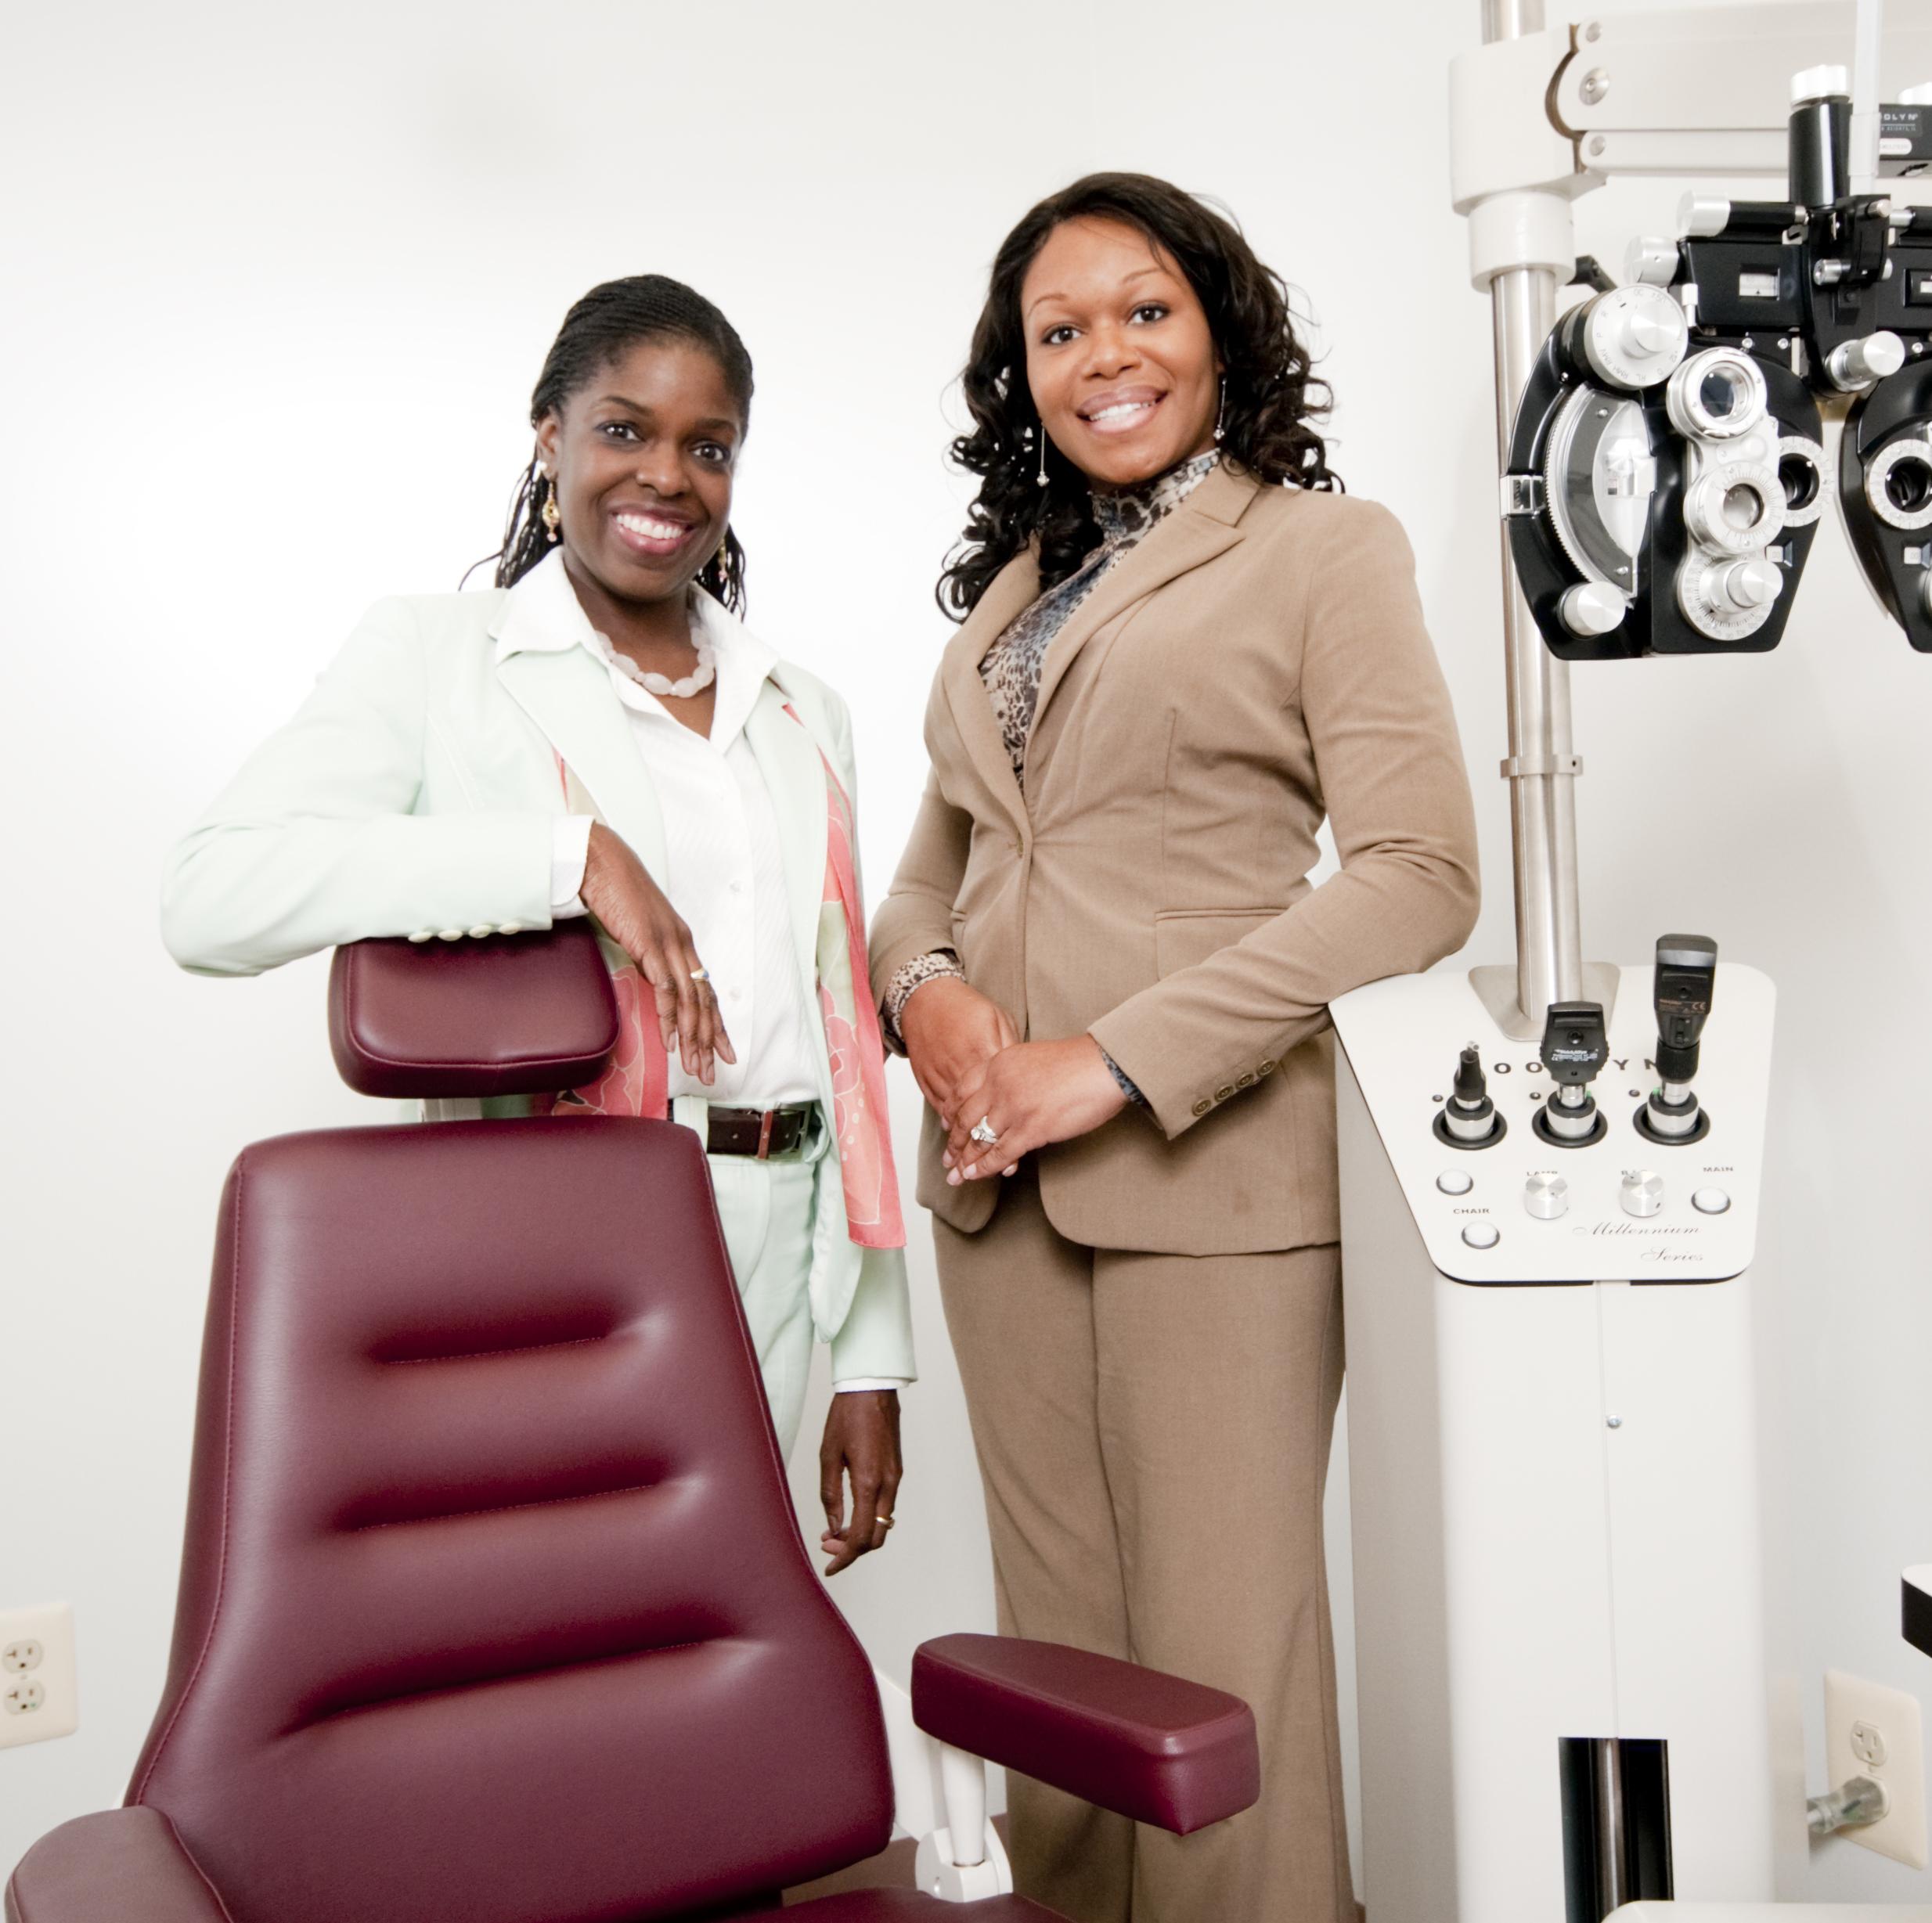 Ophthalmologist Marketing Photo